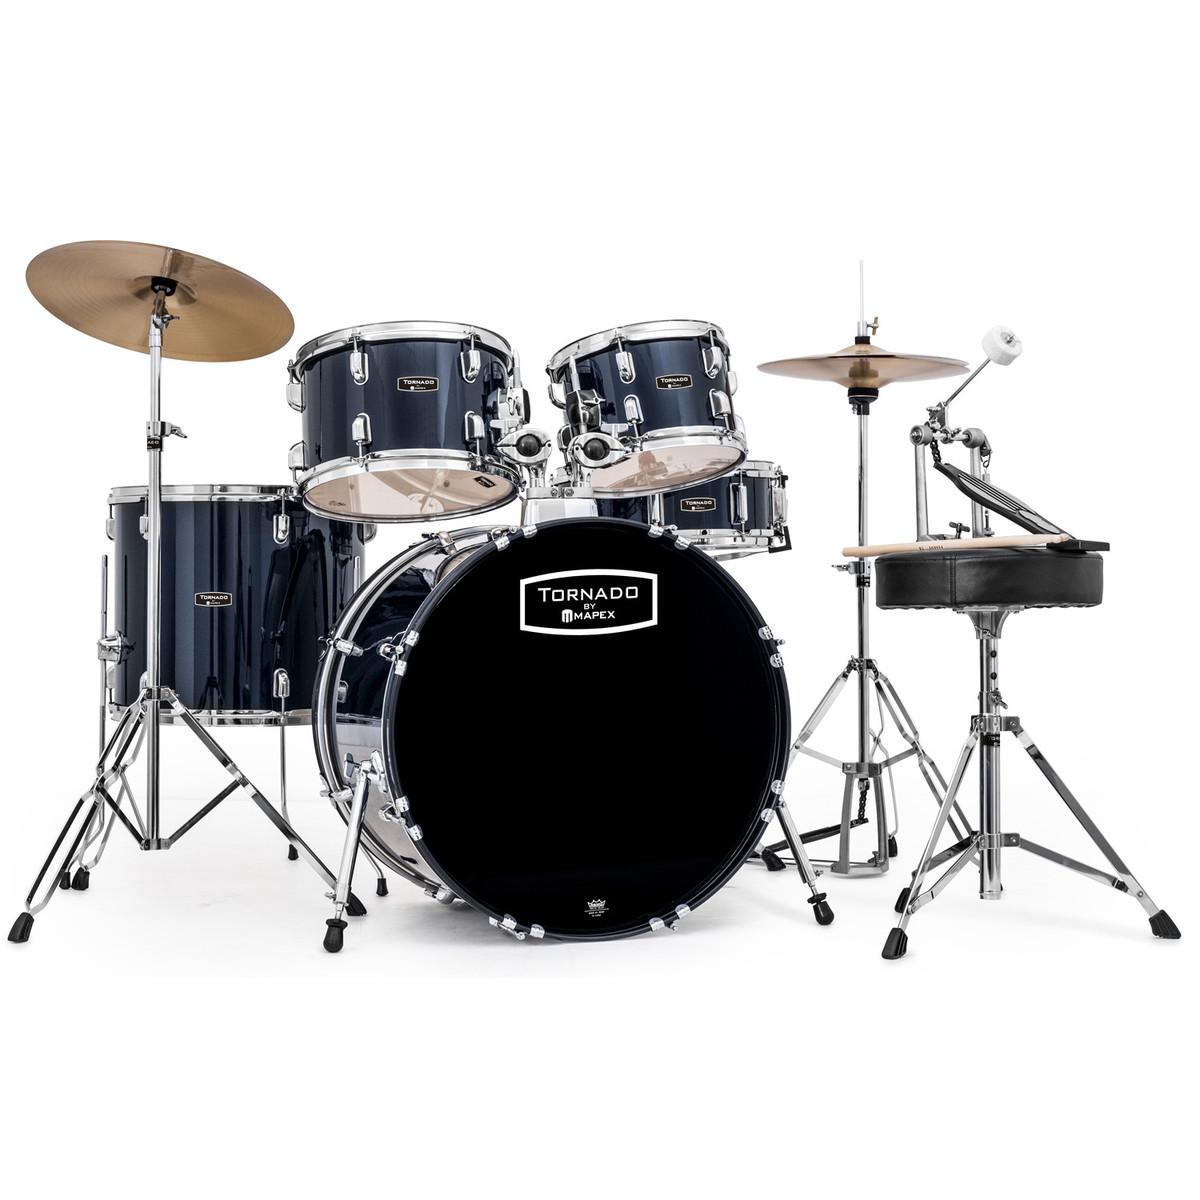 Mapex Tornado Iii 22 Rock Fusion Drum Kit Blue Box